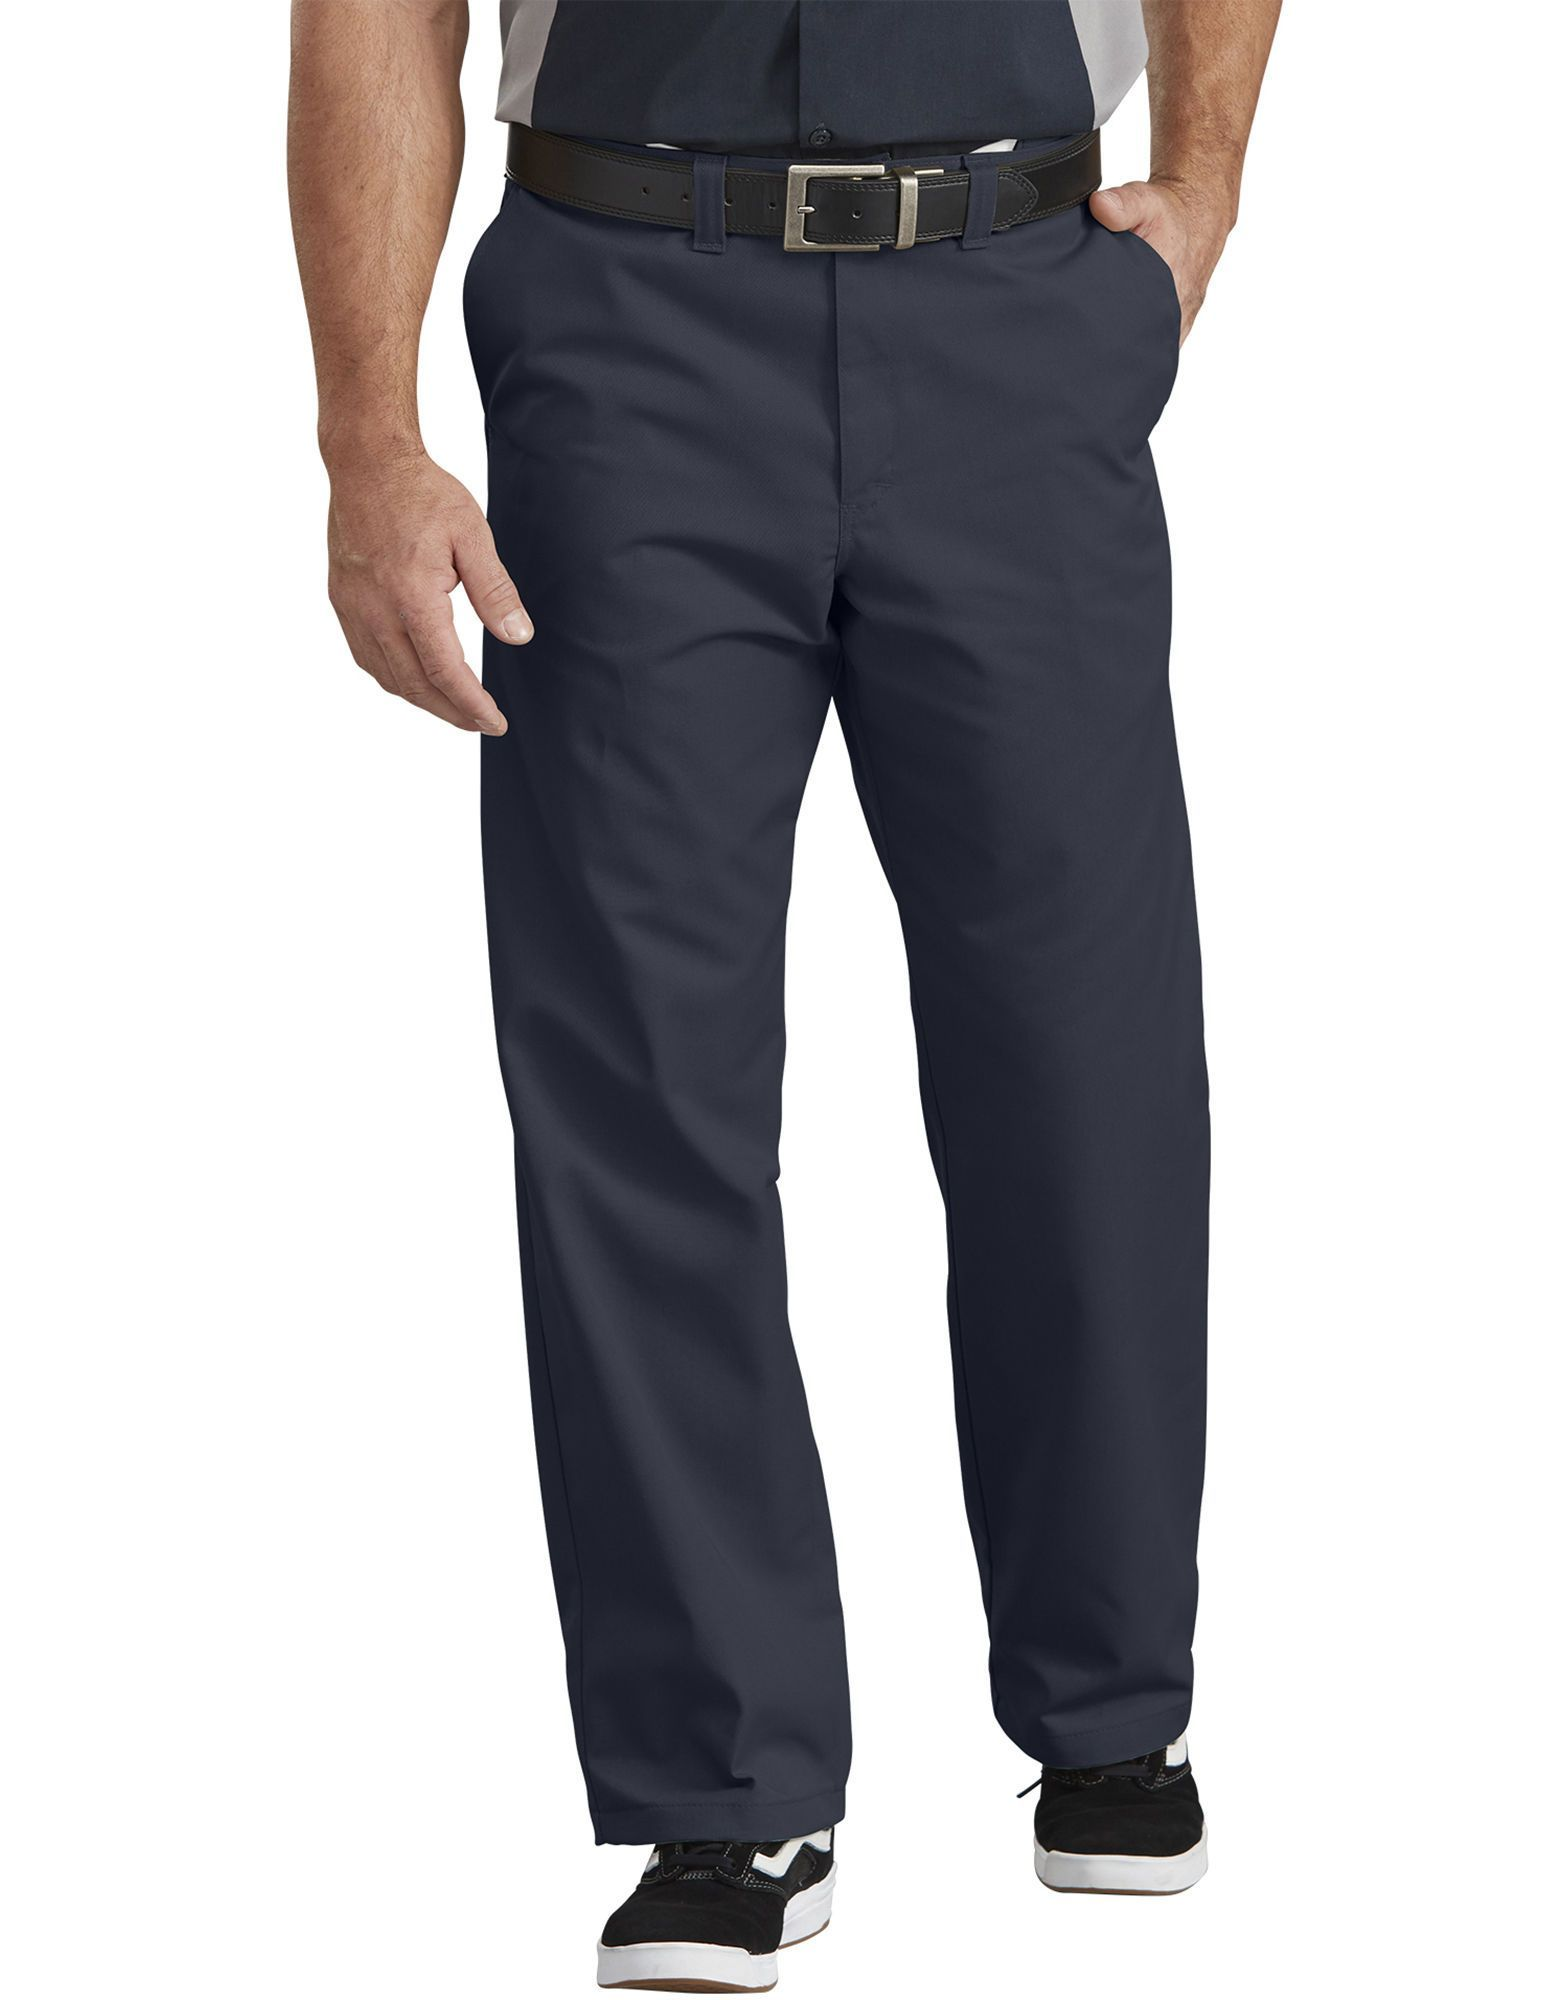 P- Dickies Flat Front Comfort Pant-Dow